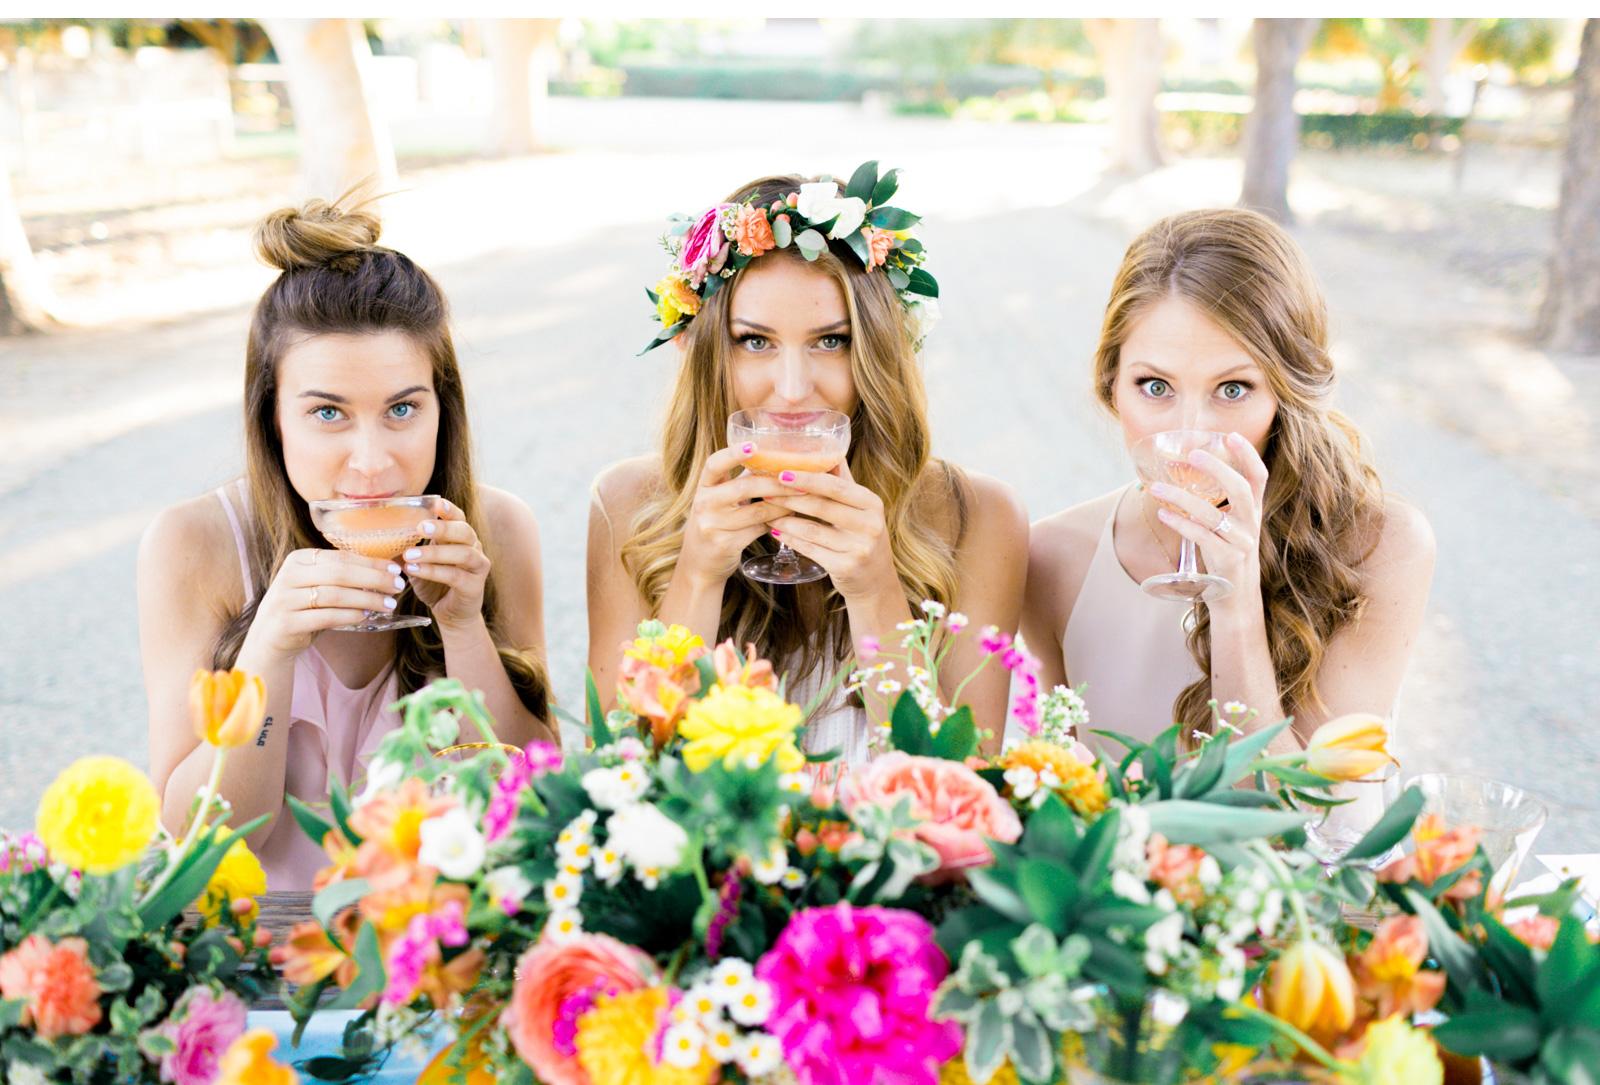 Whispering-Rose-Ranch-Wedding-Natalie-Schutt-Fine-Art-Photography-Style-Me-Pretty_16.jpg